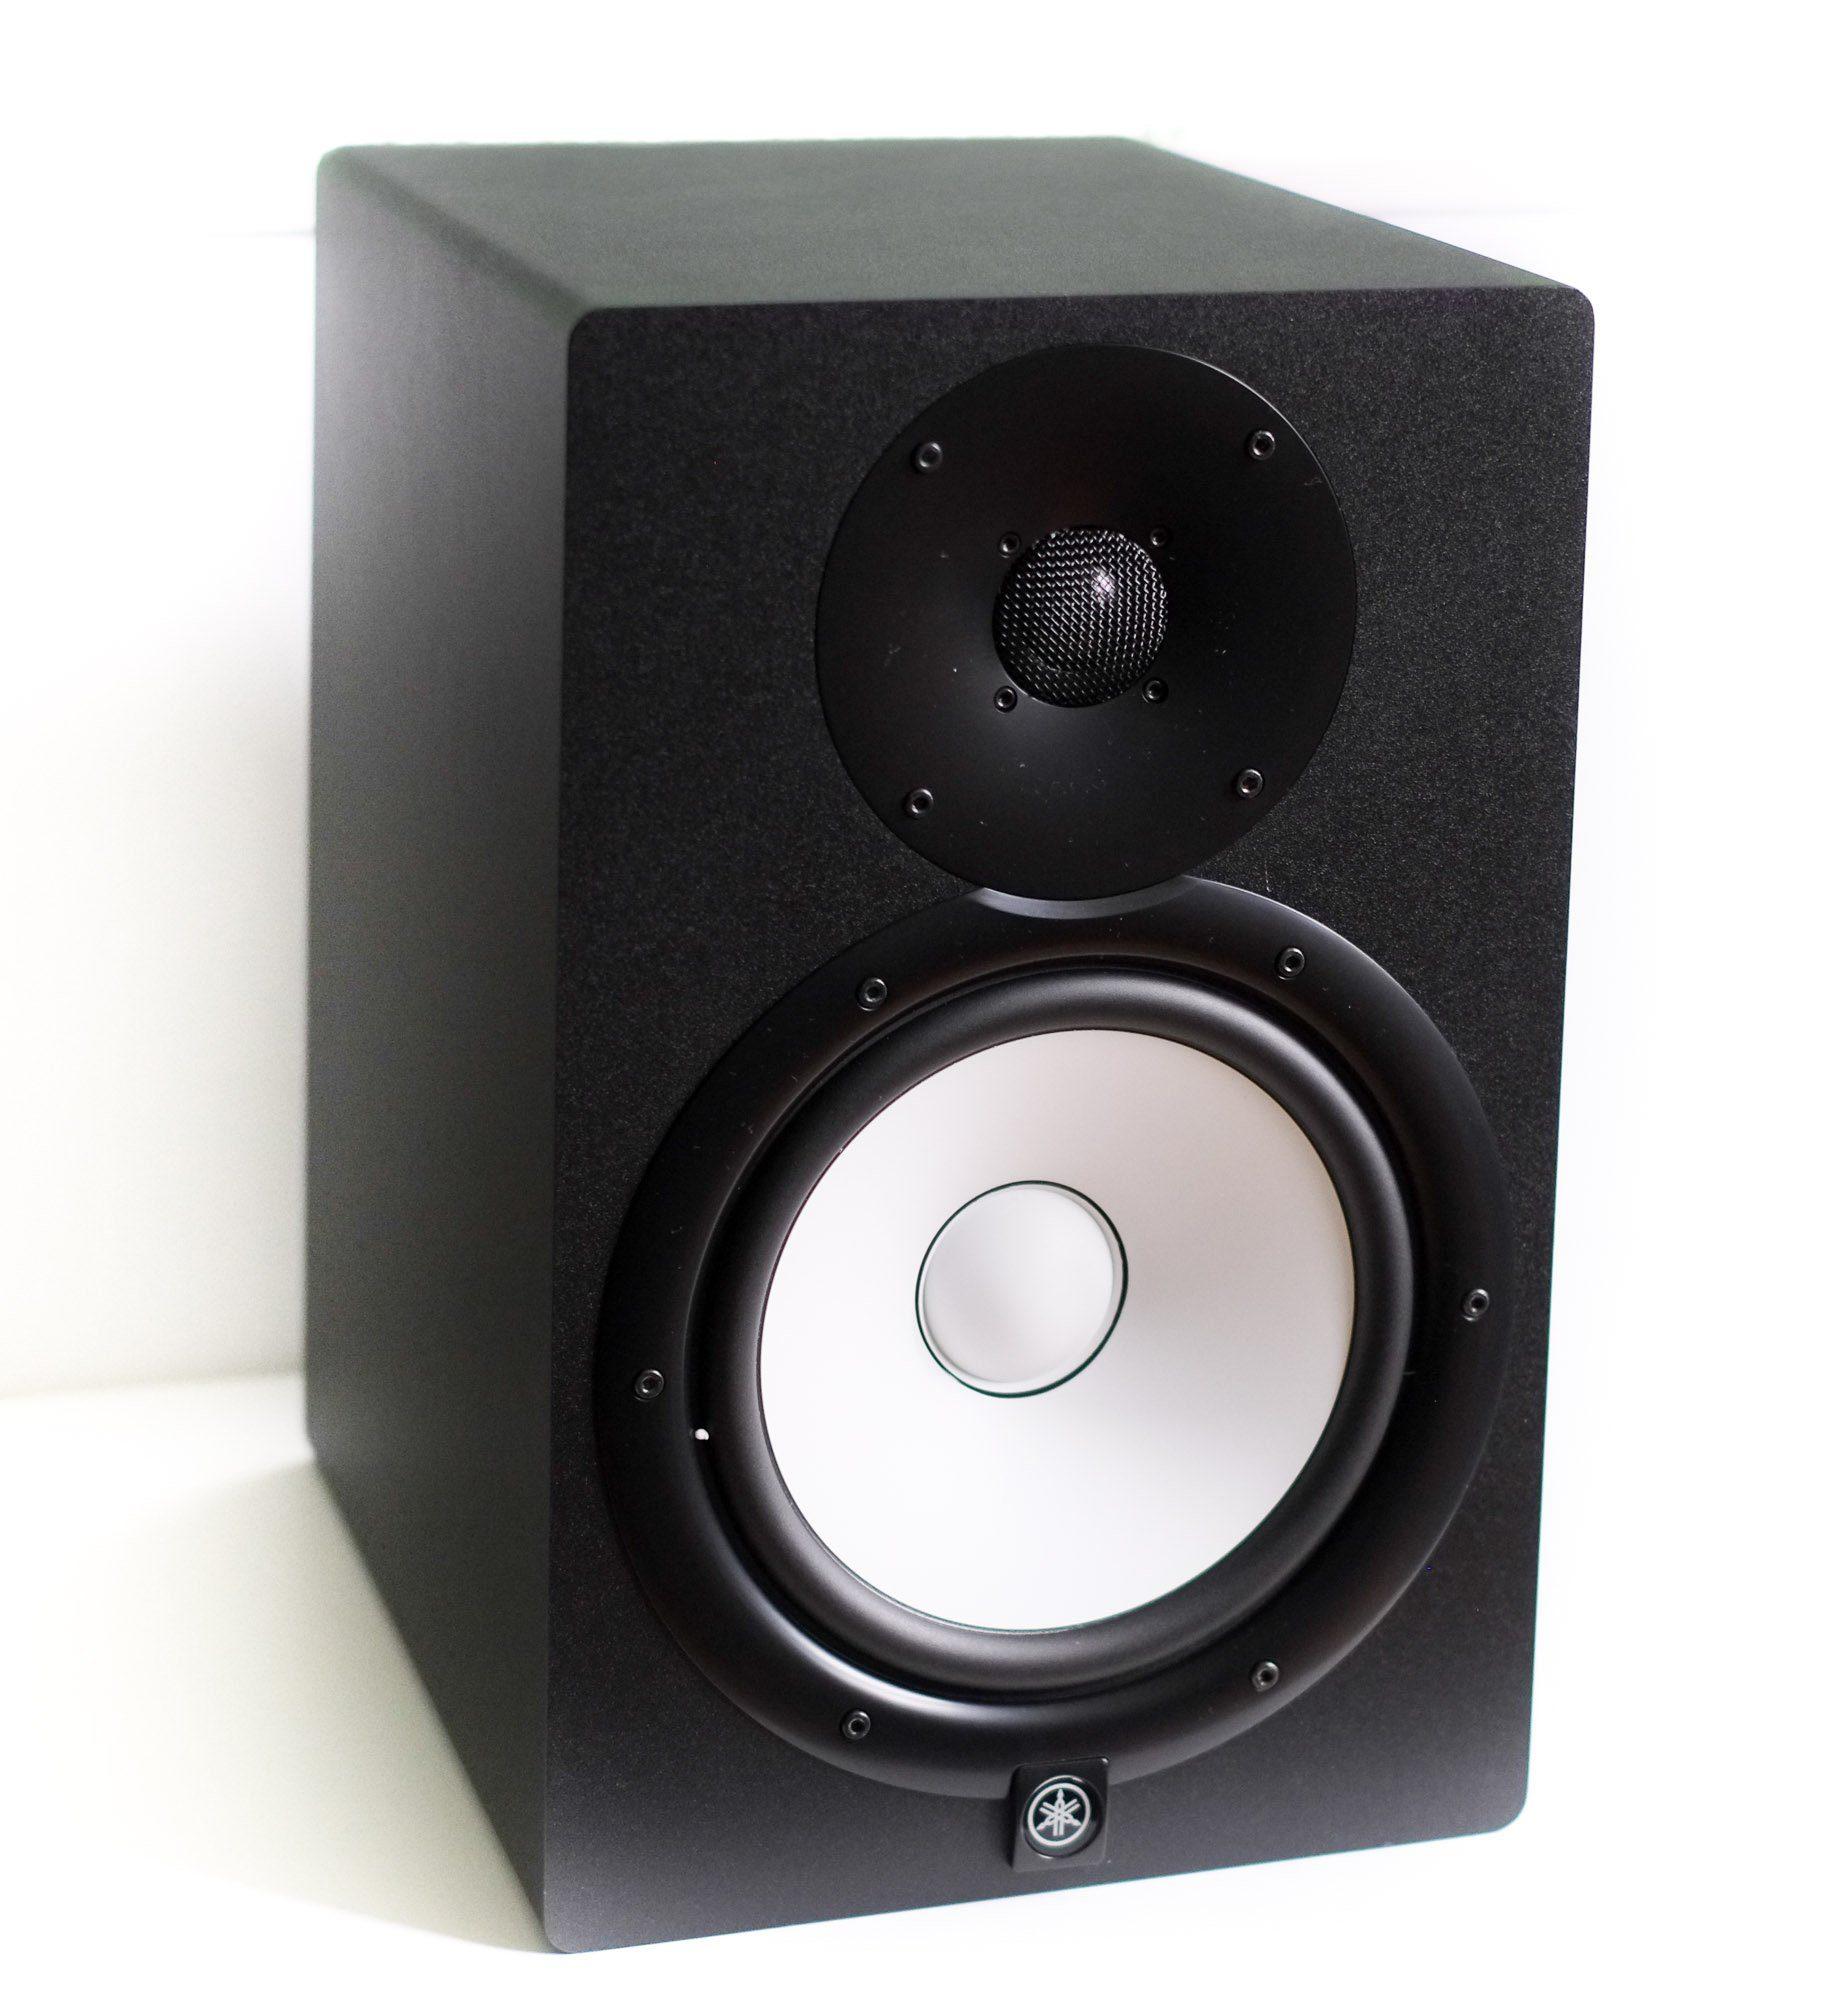 vergleichstest studiomonitore yamaha hs 8 krk rokit 8 g3. Black Bedroom Furniture Sets. Home Design Ideas